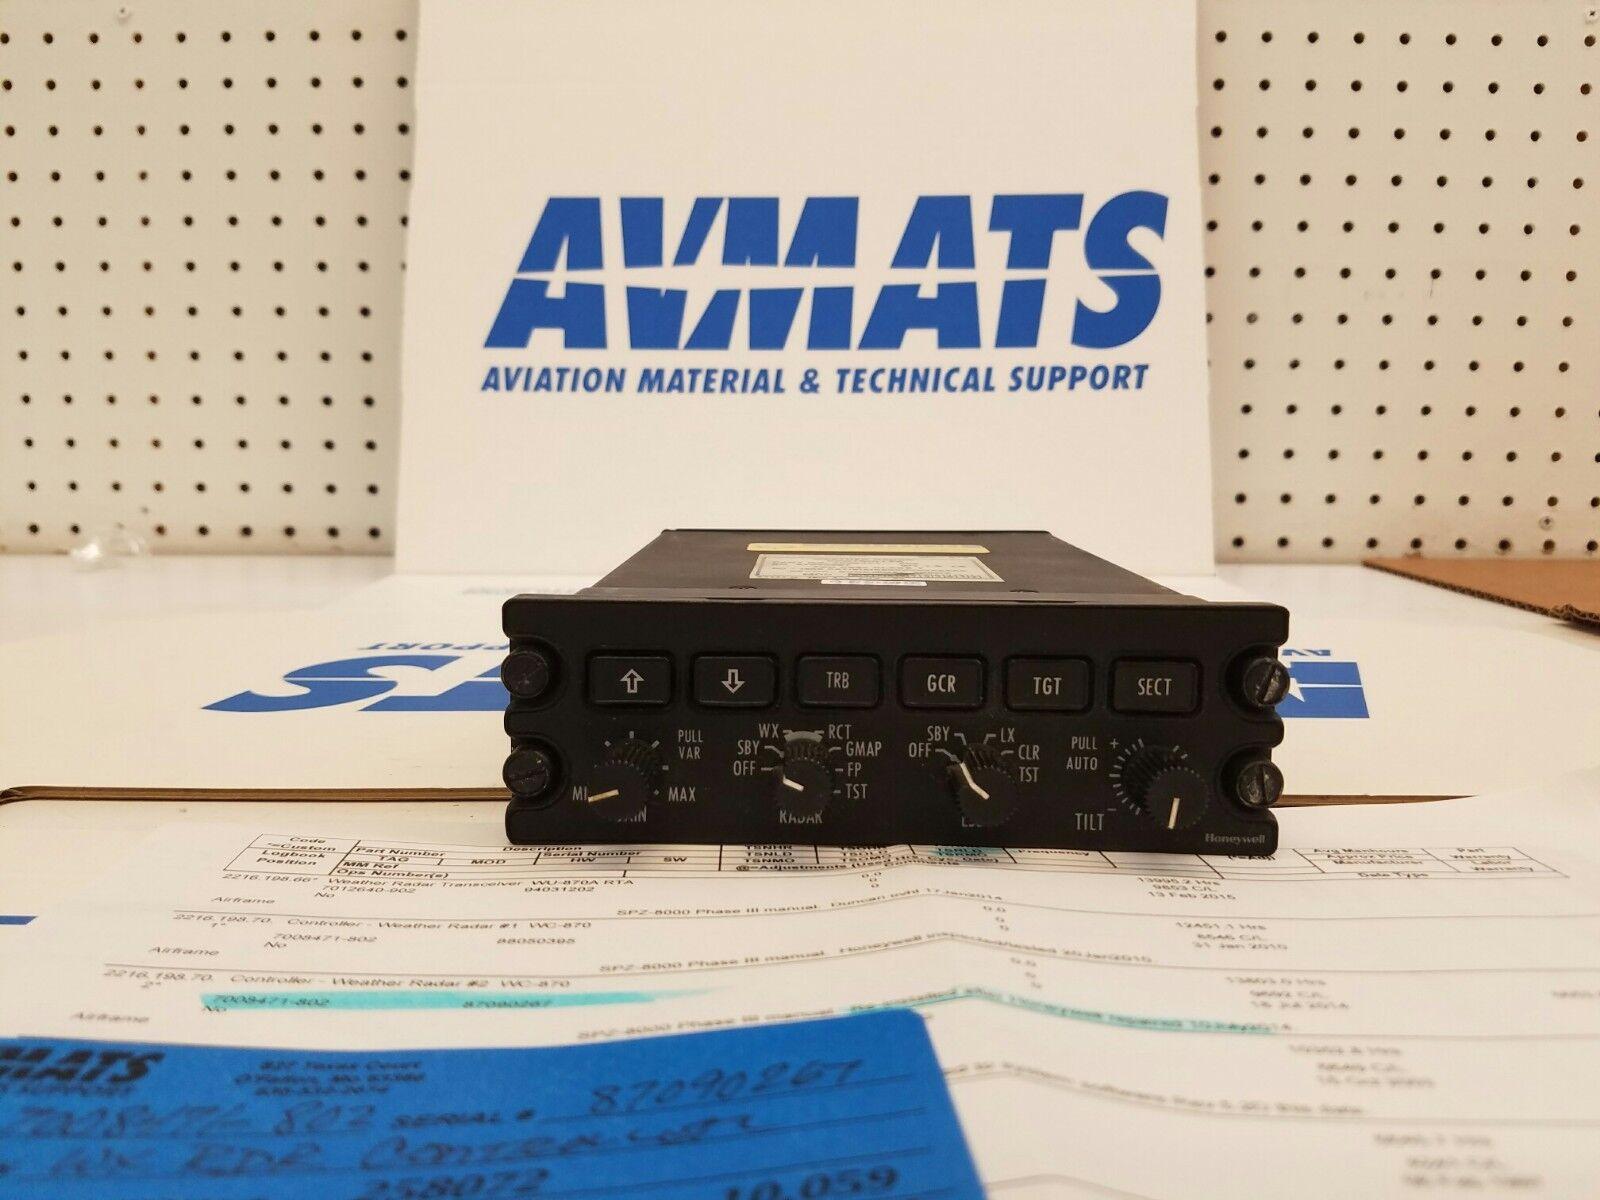 Honeywell p/n 7008471-802 WC-870 WEATHER RADAR CONTROLLER | eBay